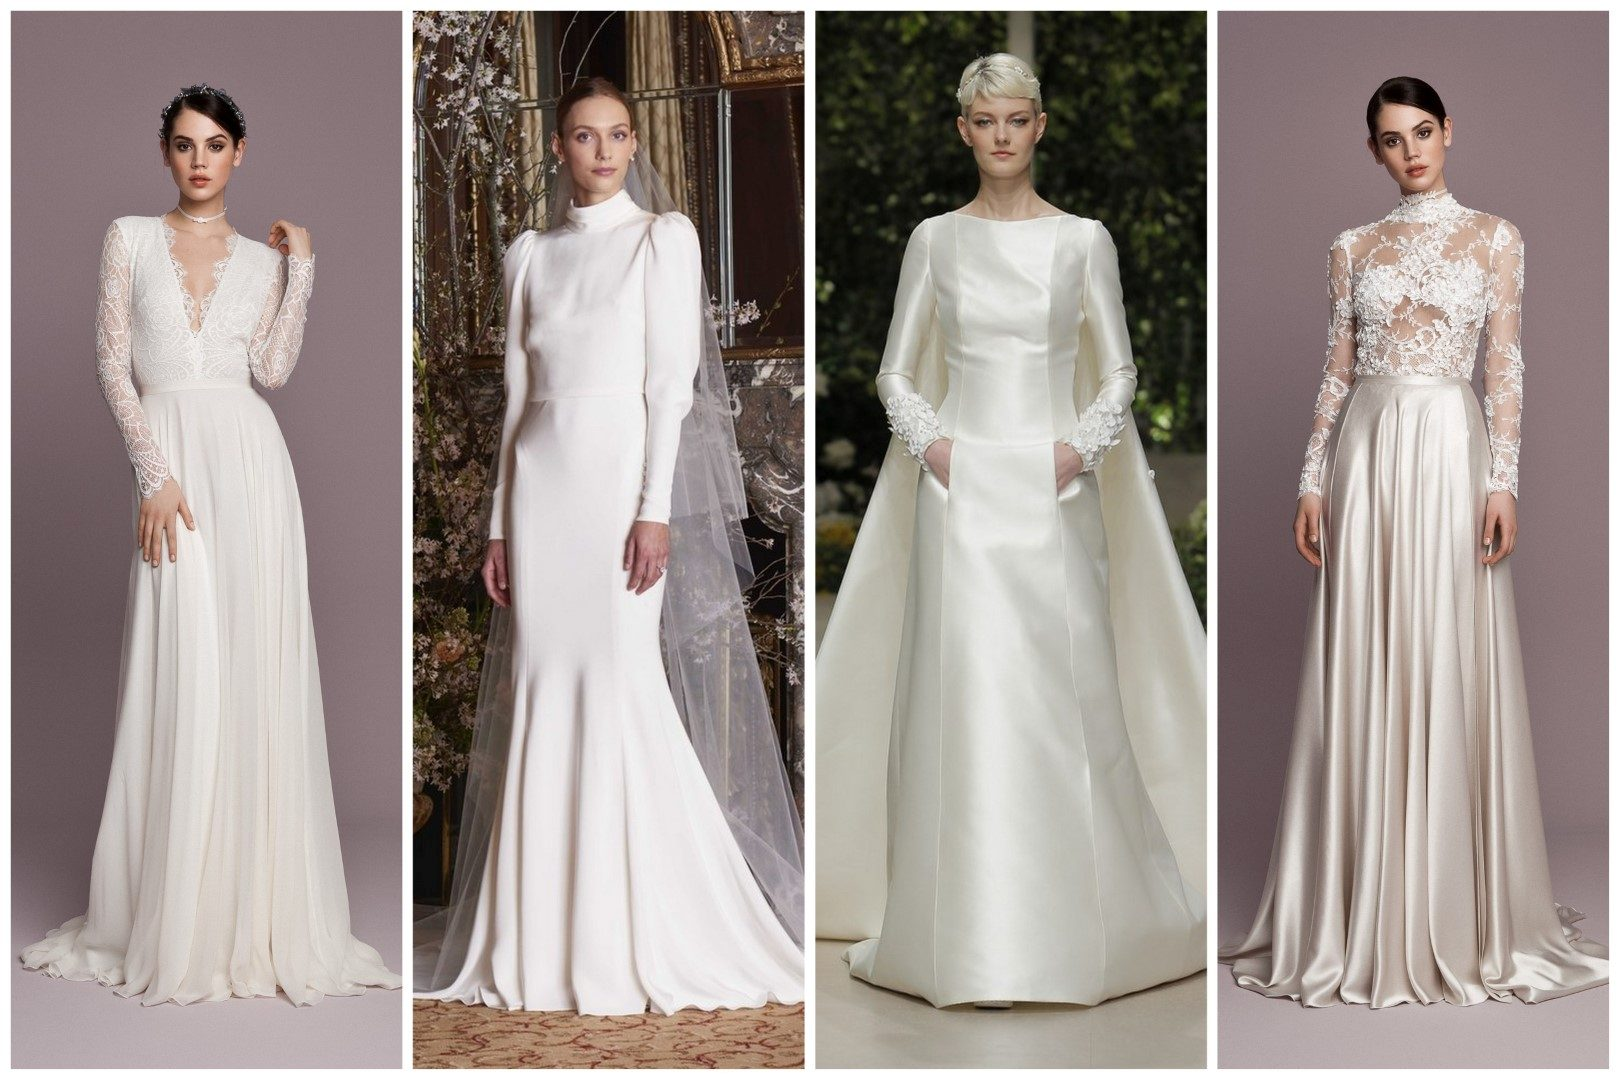 f3090978c3 Daalarna, Monique Lhuillier, Pronovias, Daalarna menyasszonyi ruha 2019-re